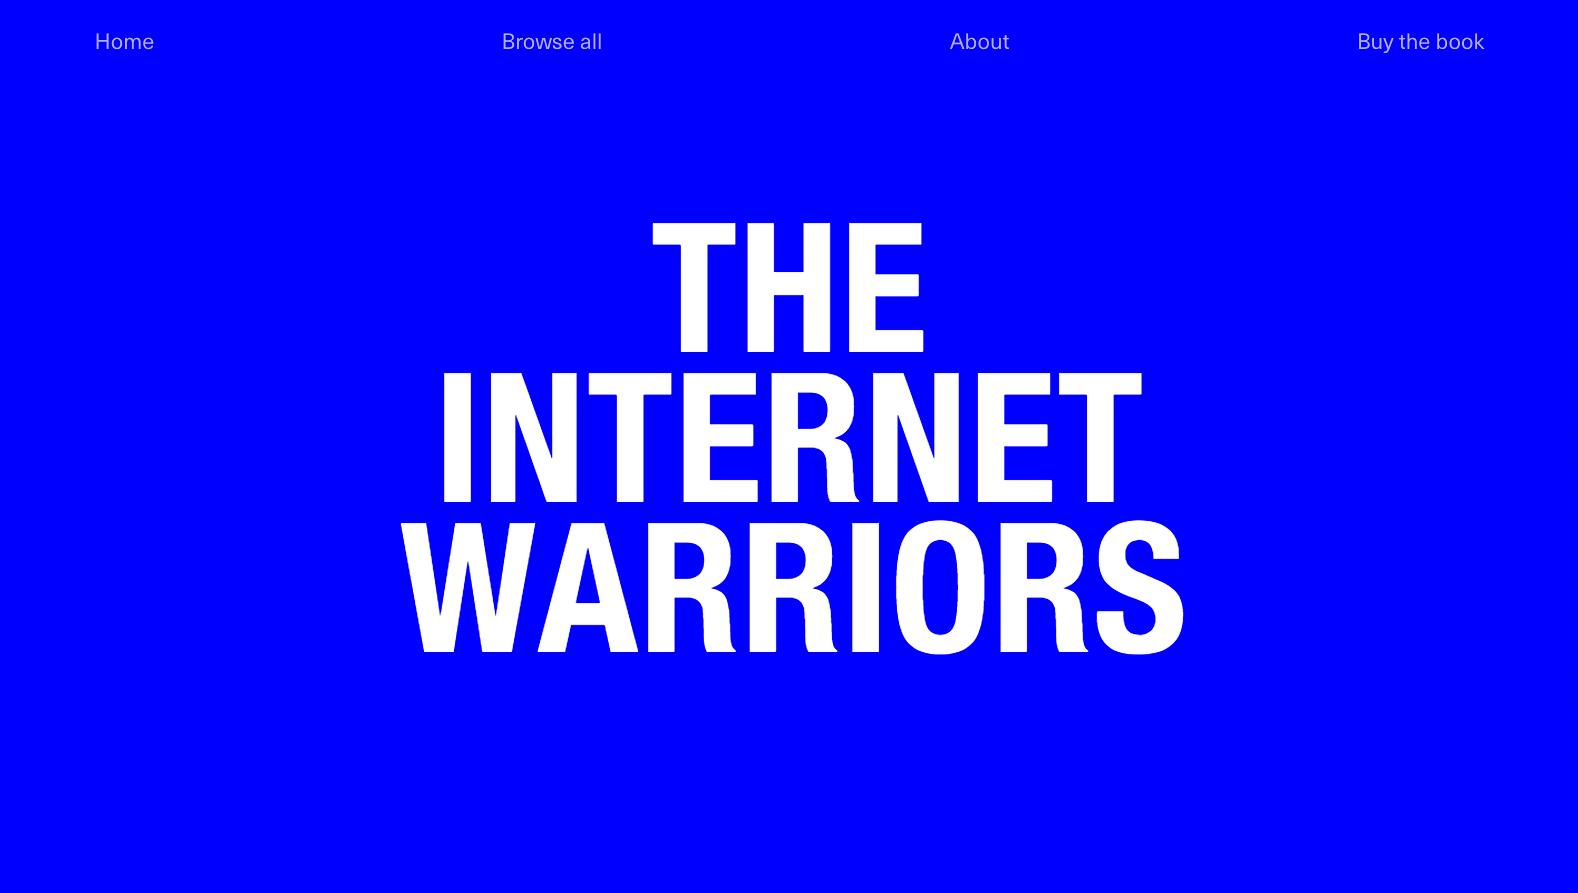 The Internet Warriors